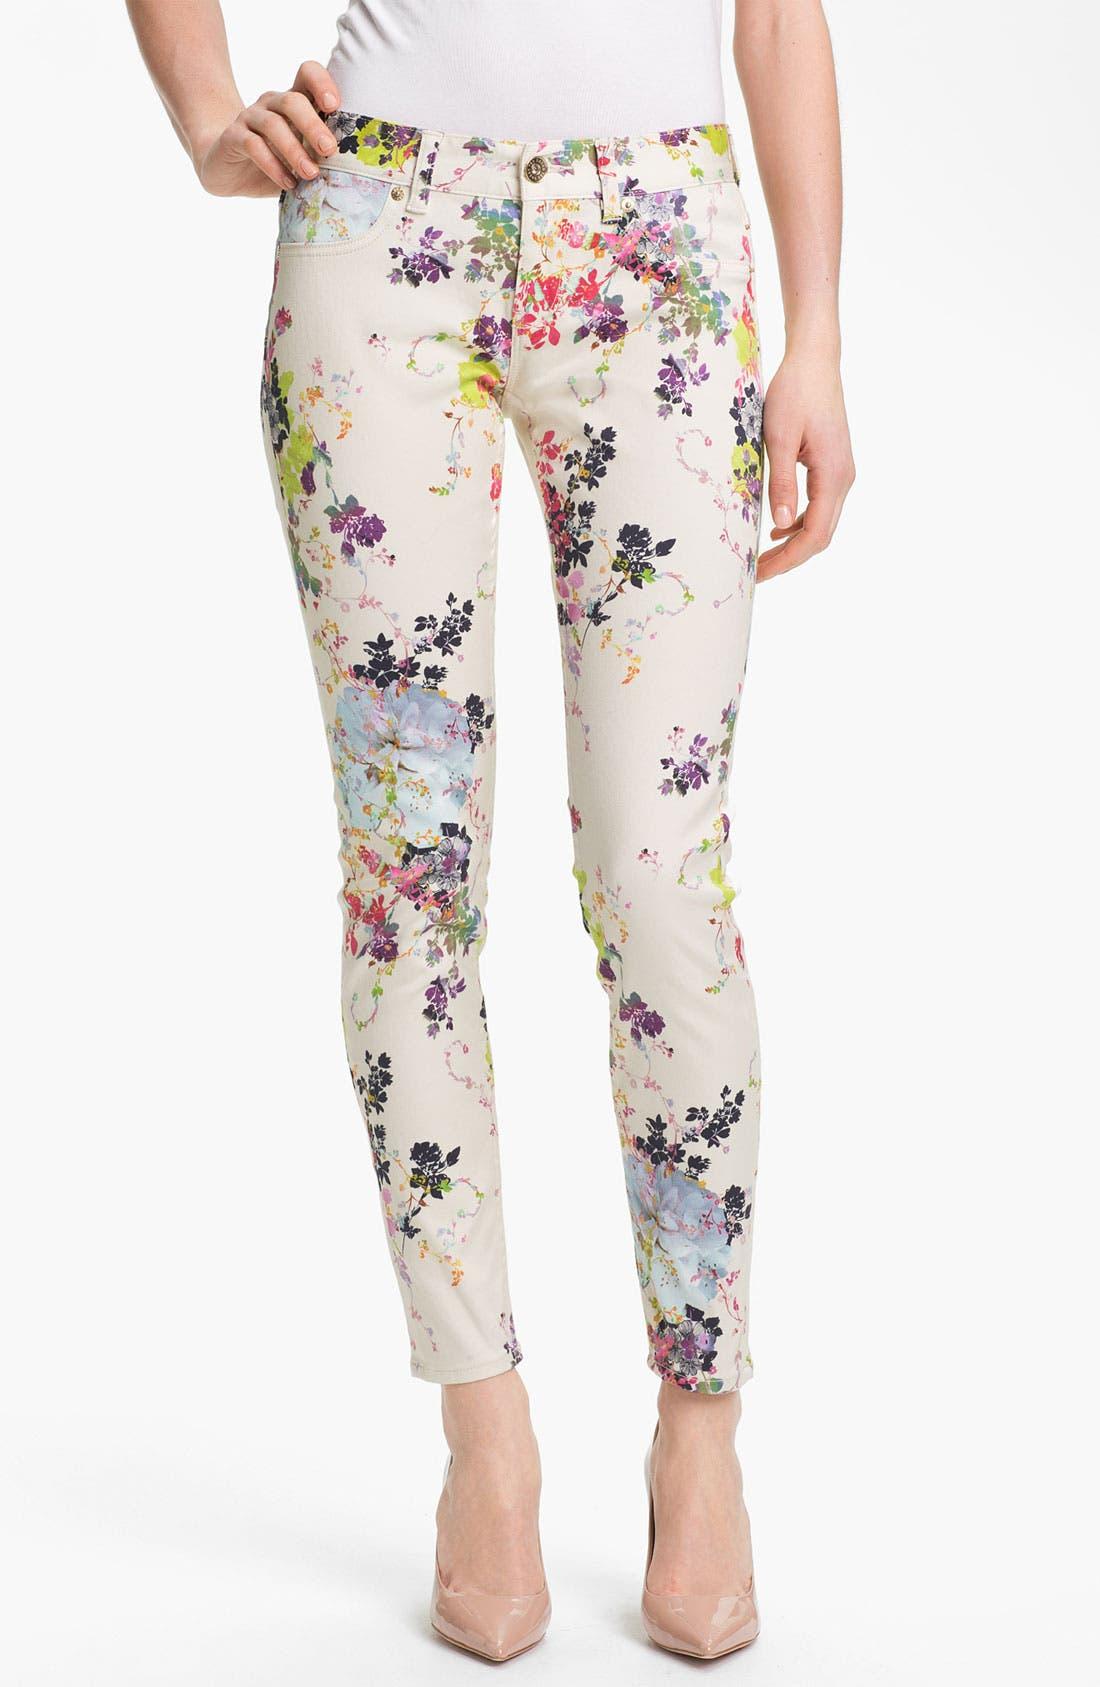 Alternate Image 1 Selected - Ted Baker London 'Summer Bloom' Print Skinny Stretch Crop Jeans (Cream)